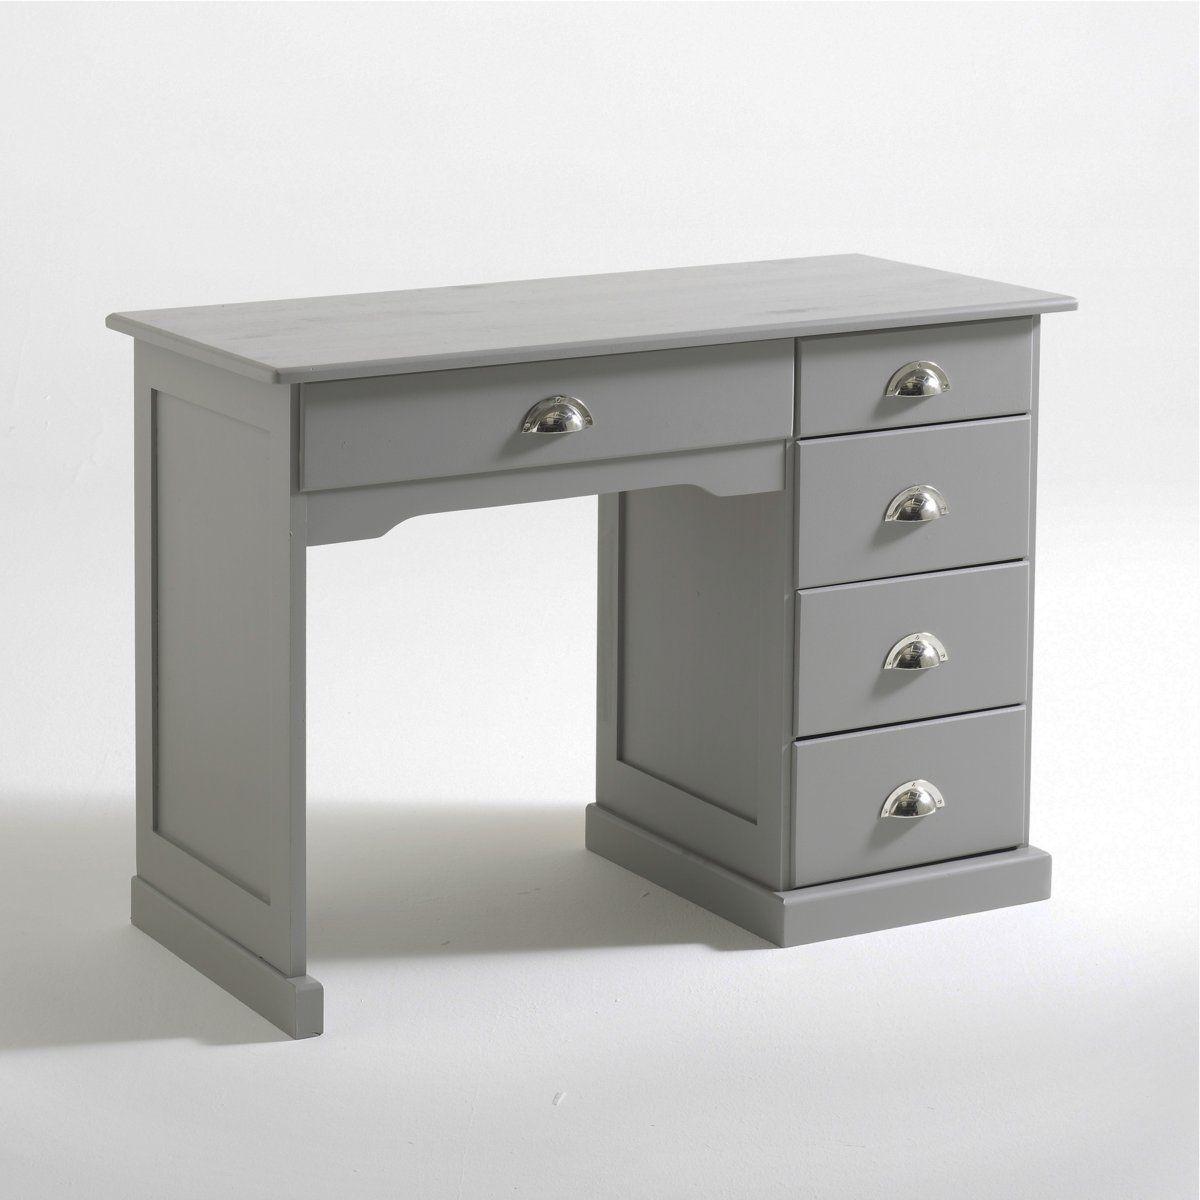 La redoute interieurs bureau pin massif betta shoppingscanner - La redoute meuble bureau ...